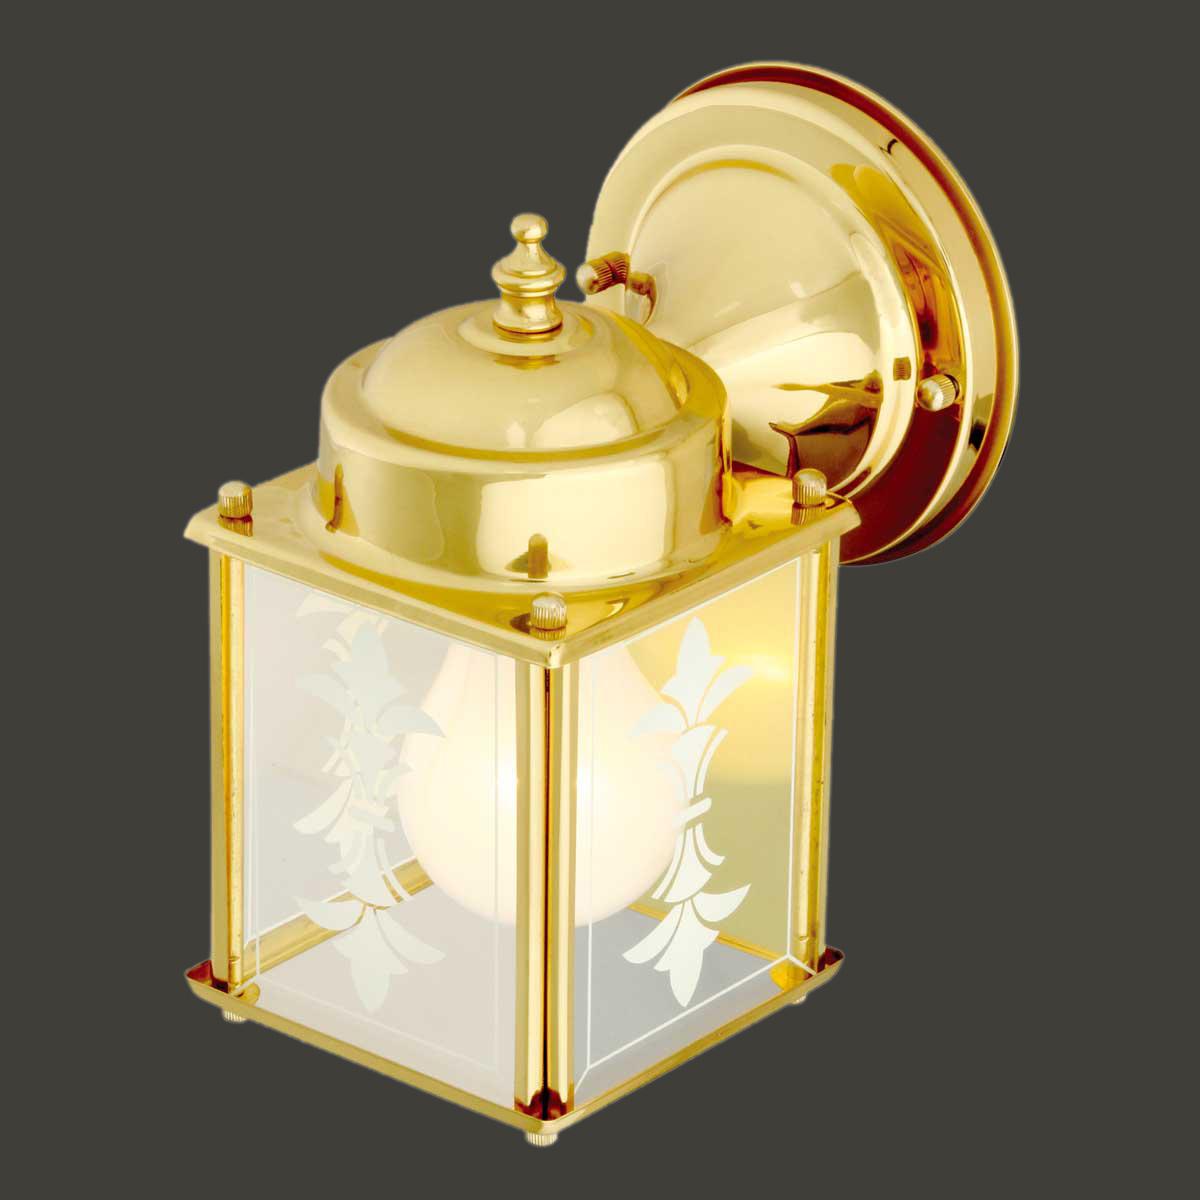 "Outdoor Wall Light Bright: Wall Light Bright Brass Outdoor Light Captain's Lamp 7""H"